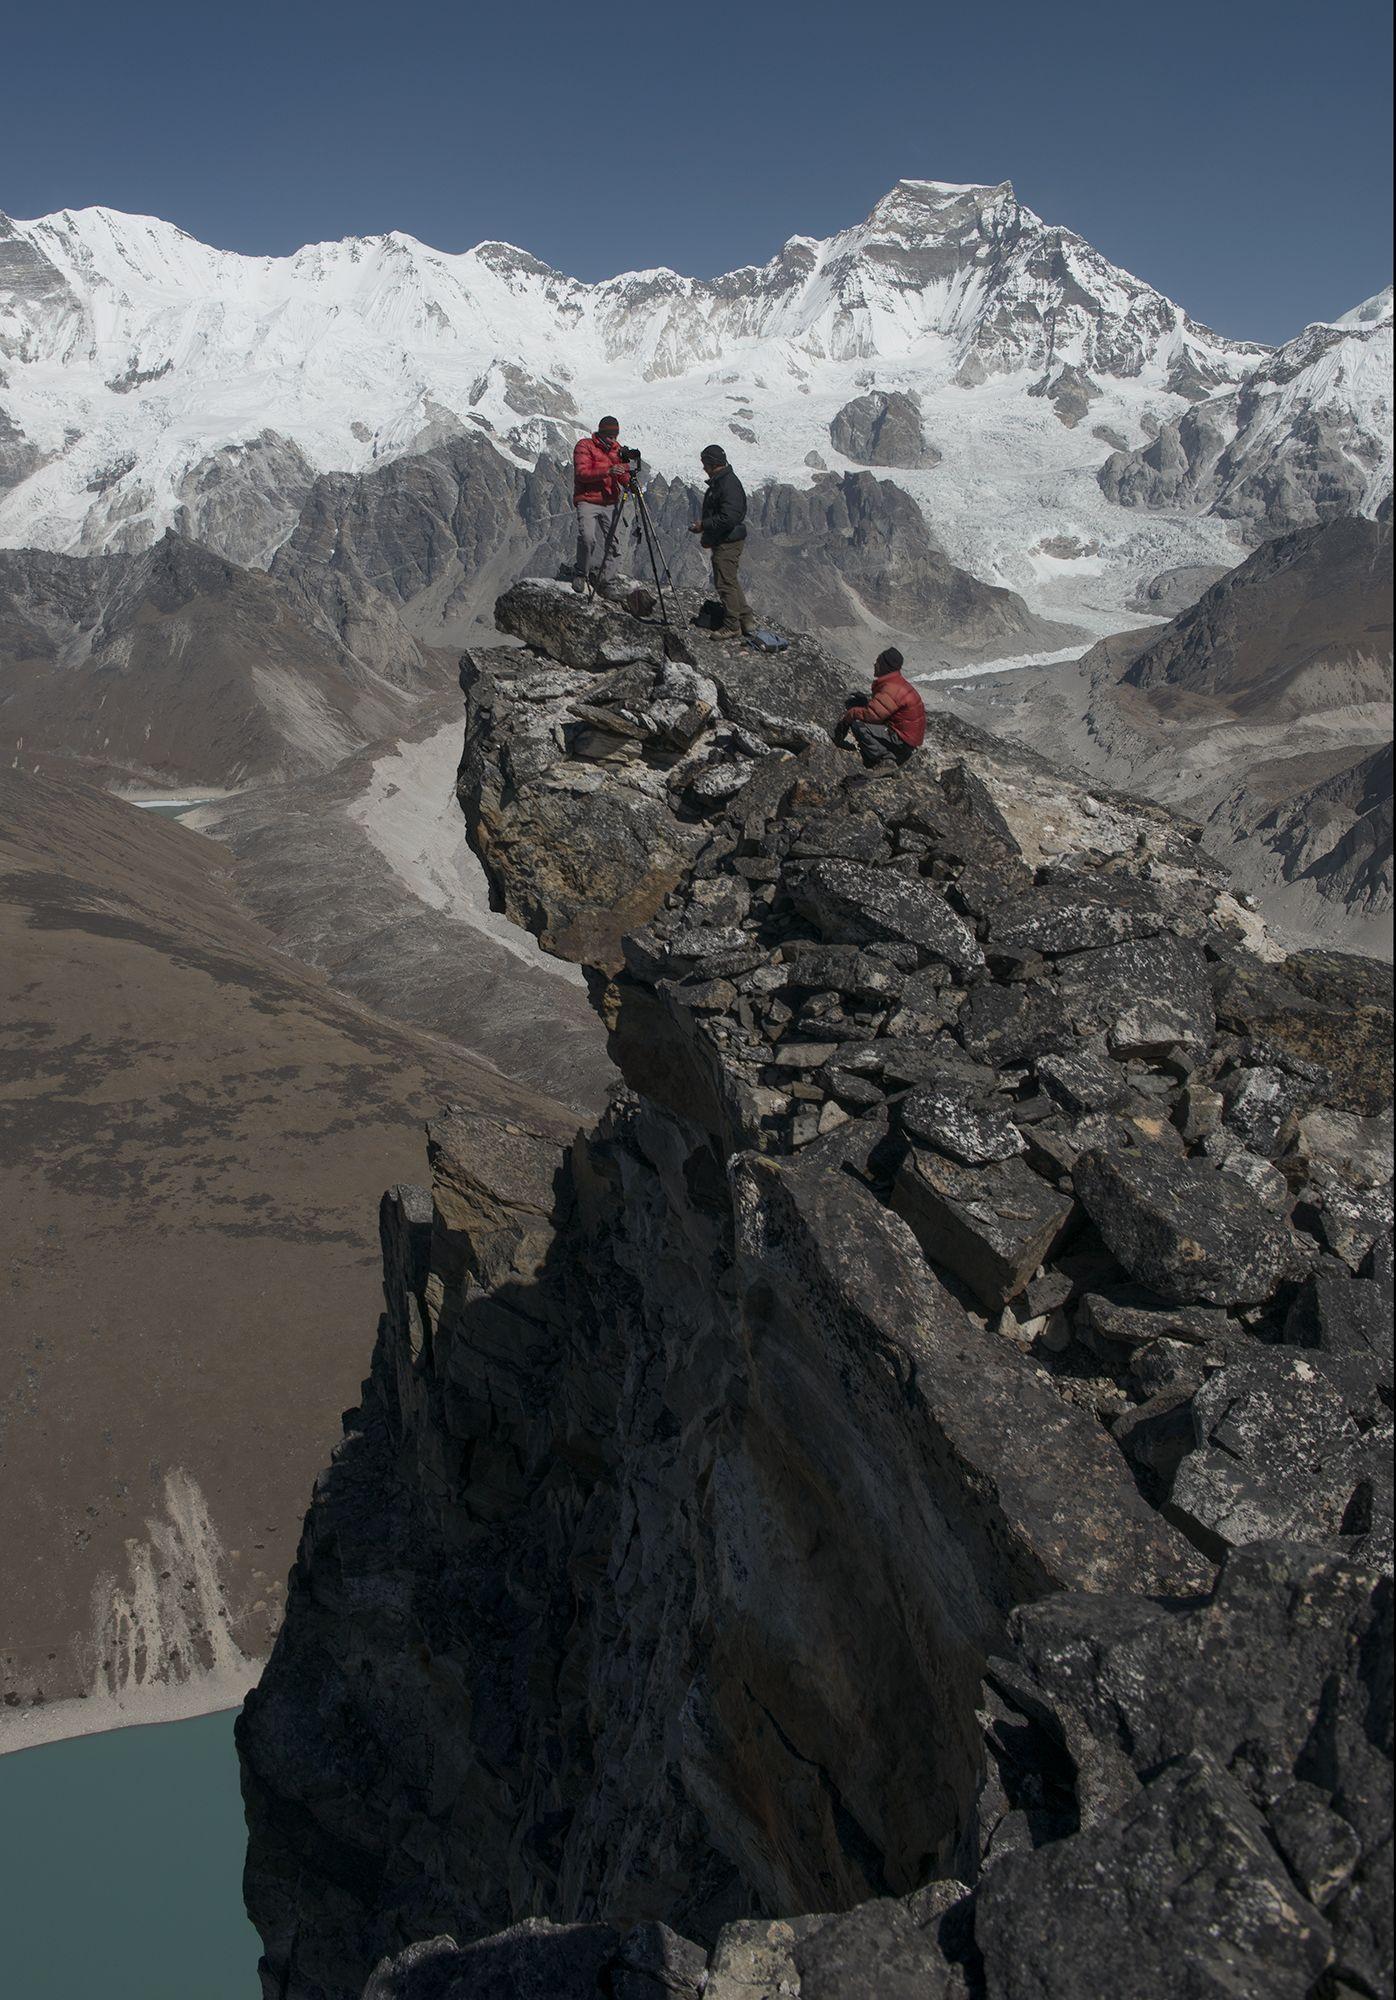 EINMALIGE VERWENDUNG David Breashears / GlacierWorks / Himalaya